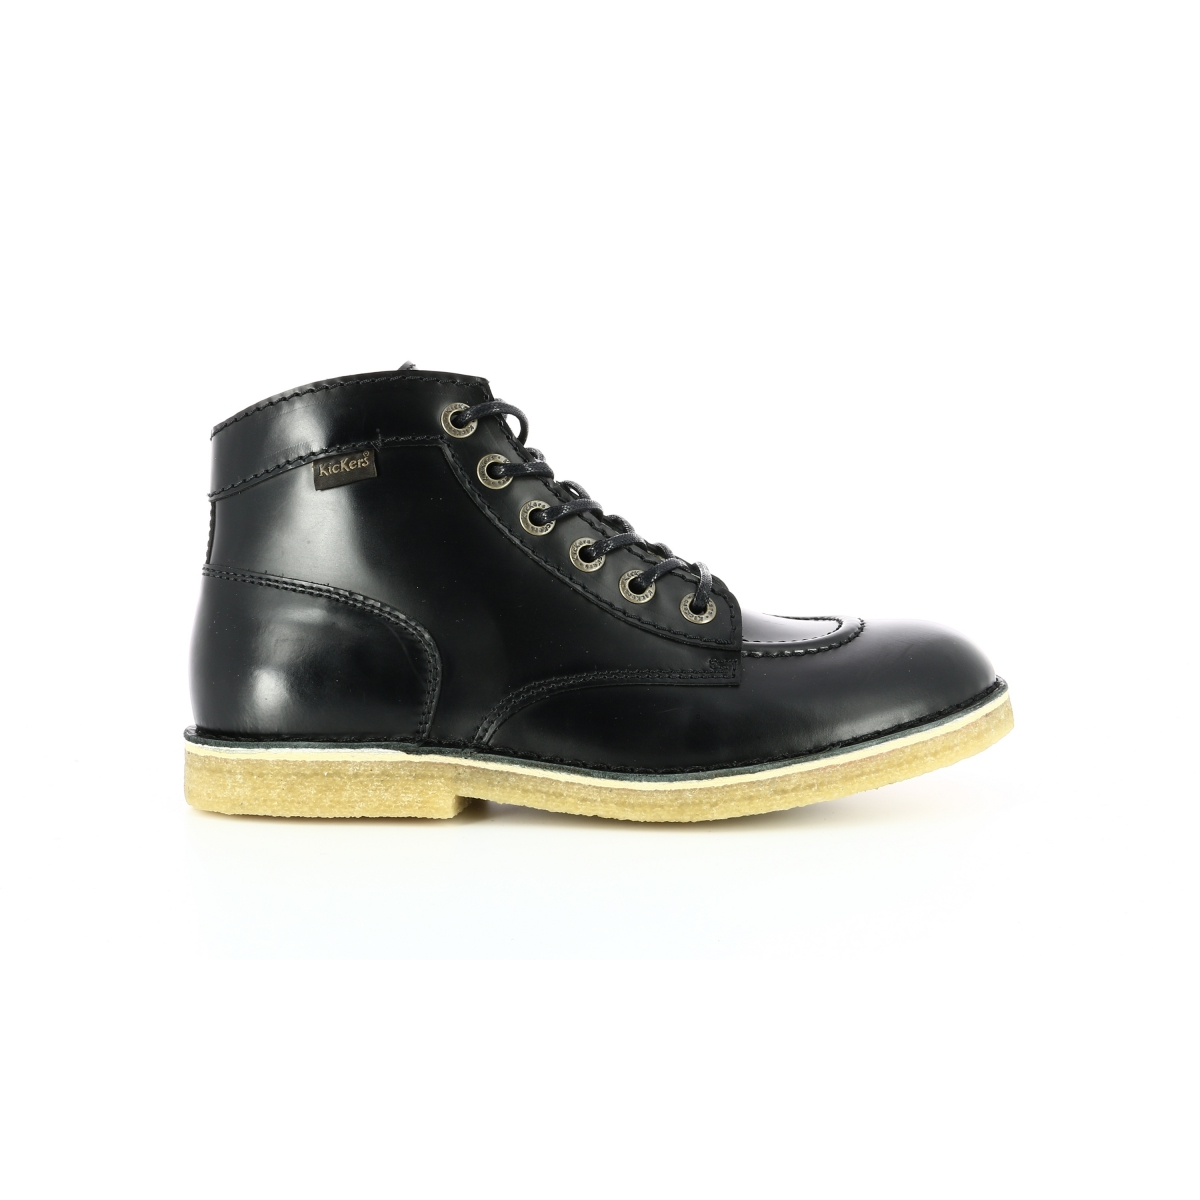 Legend Chaussures Kick Noir Kickers Homme Bx1O1qw7g